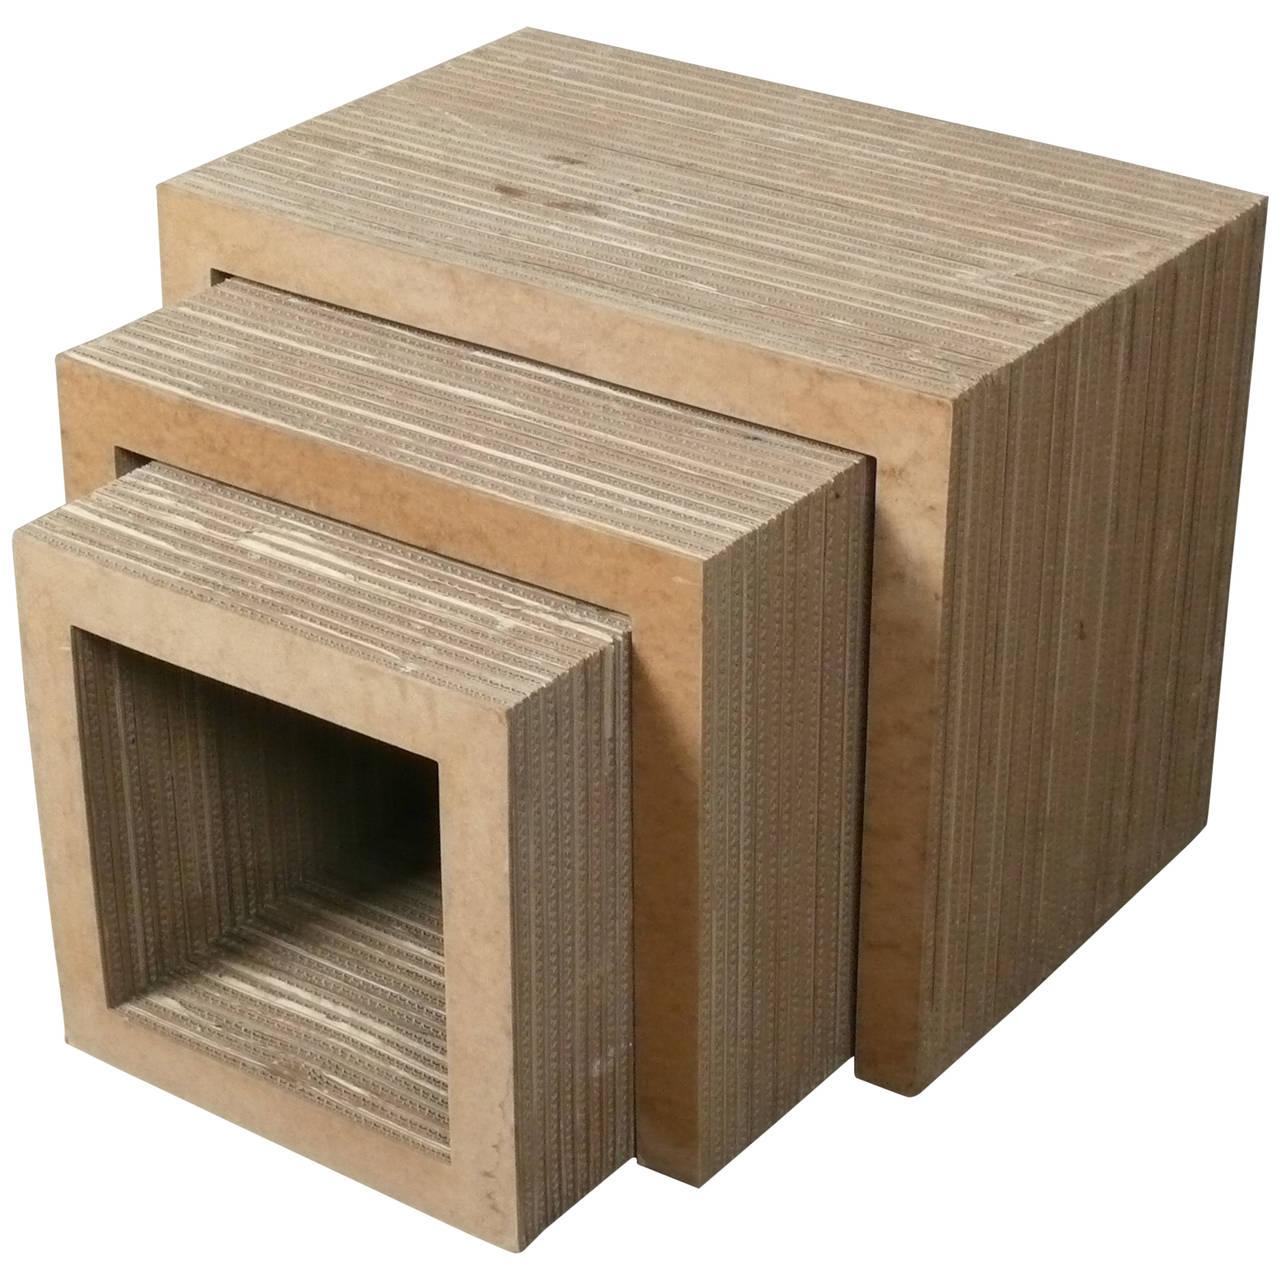 Nesting Furniture Abbey Nesting Tables Furniture Linkedlifescom